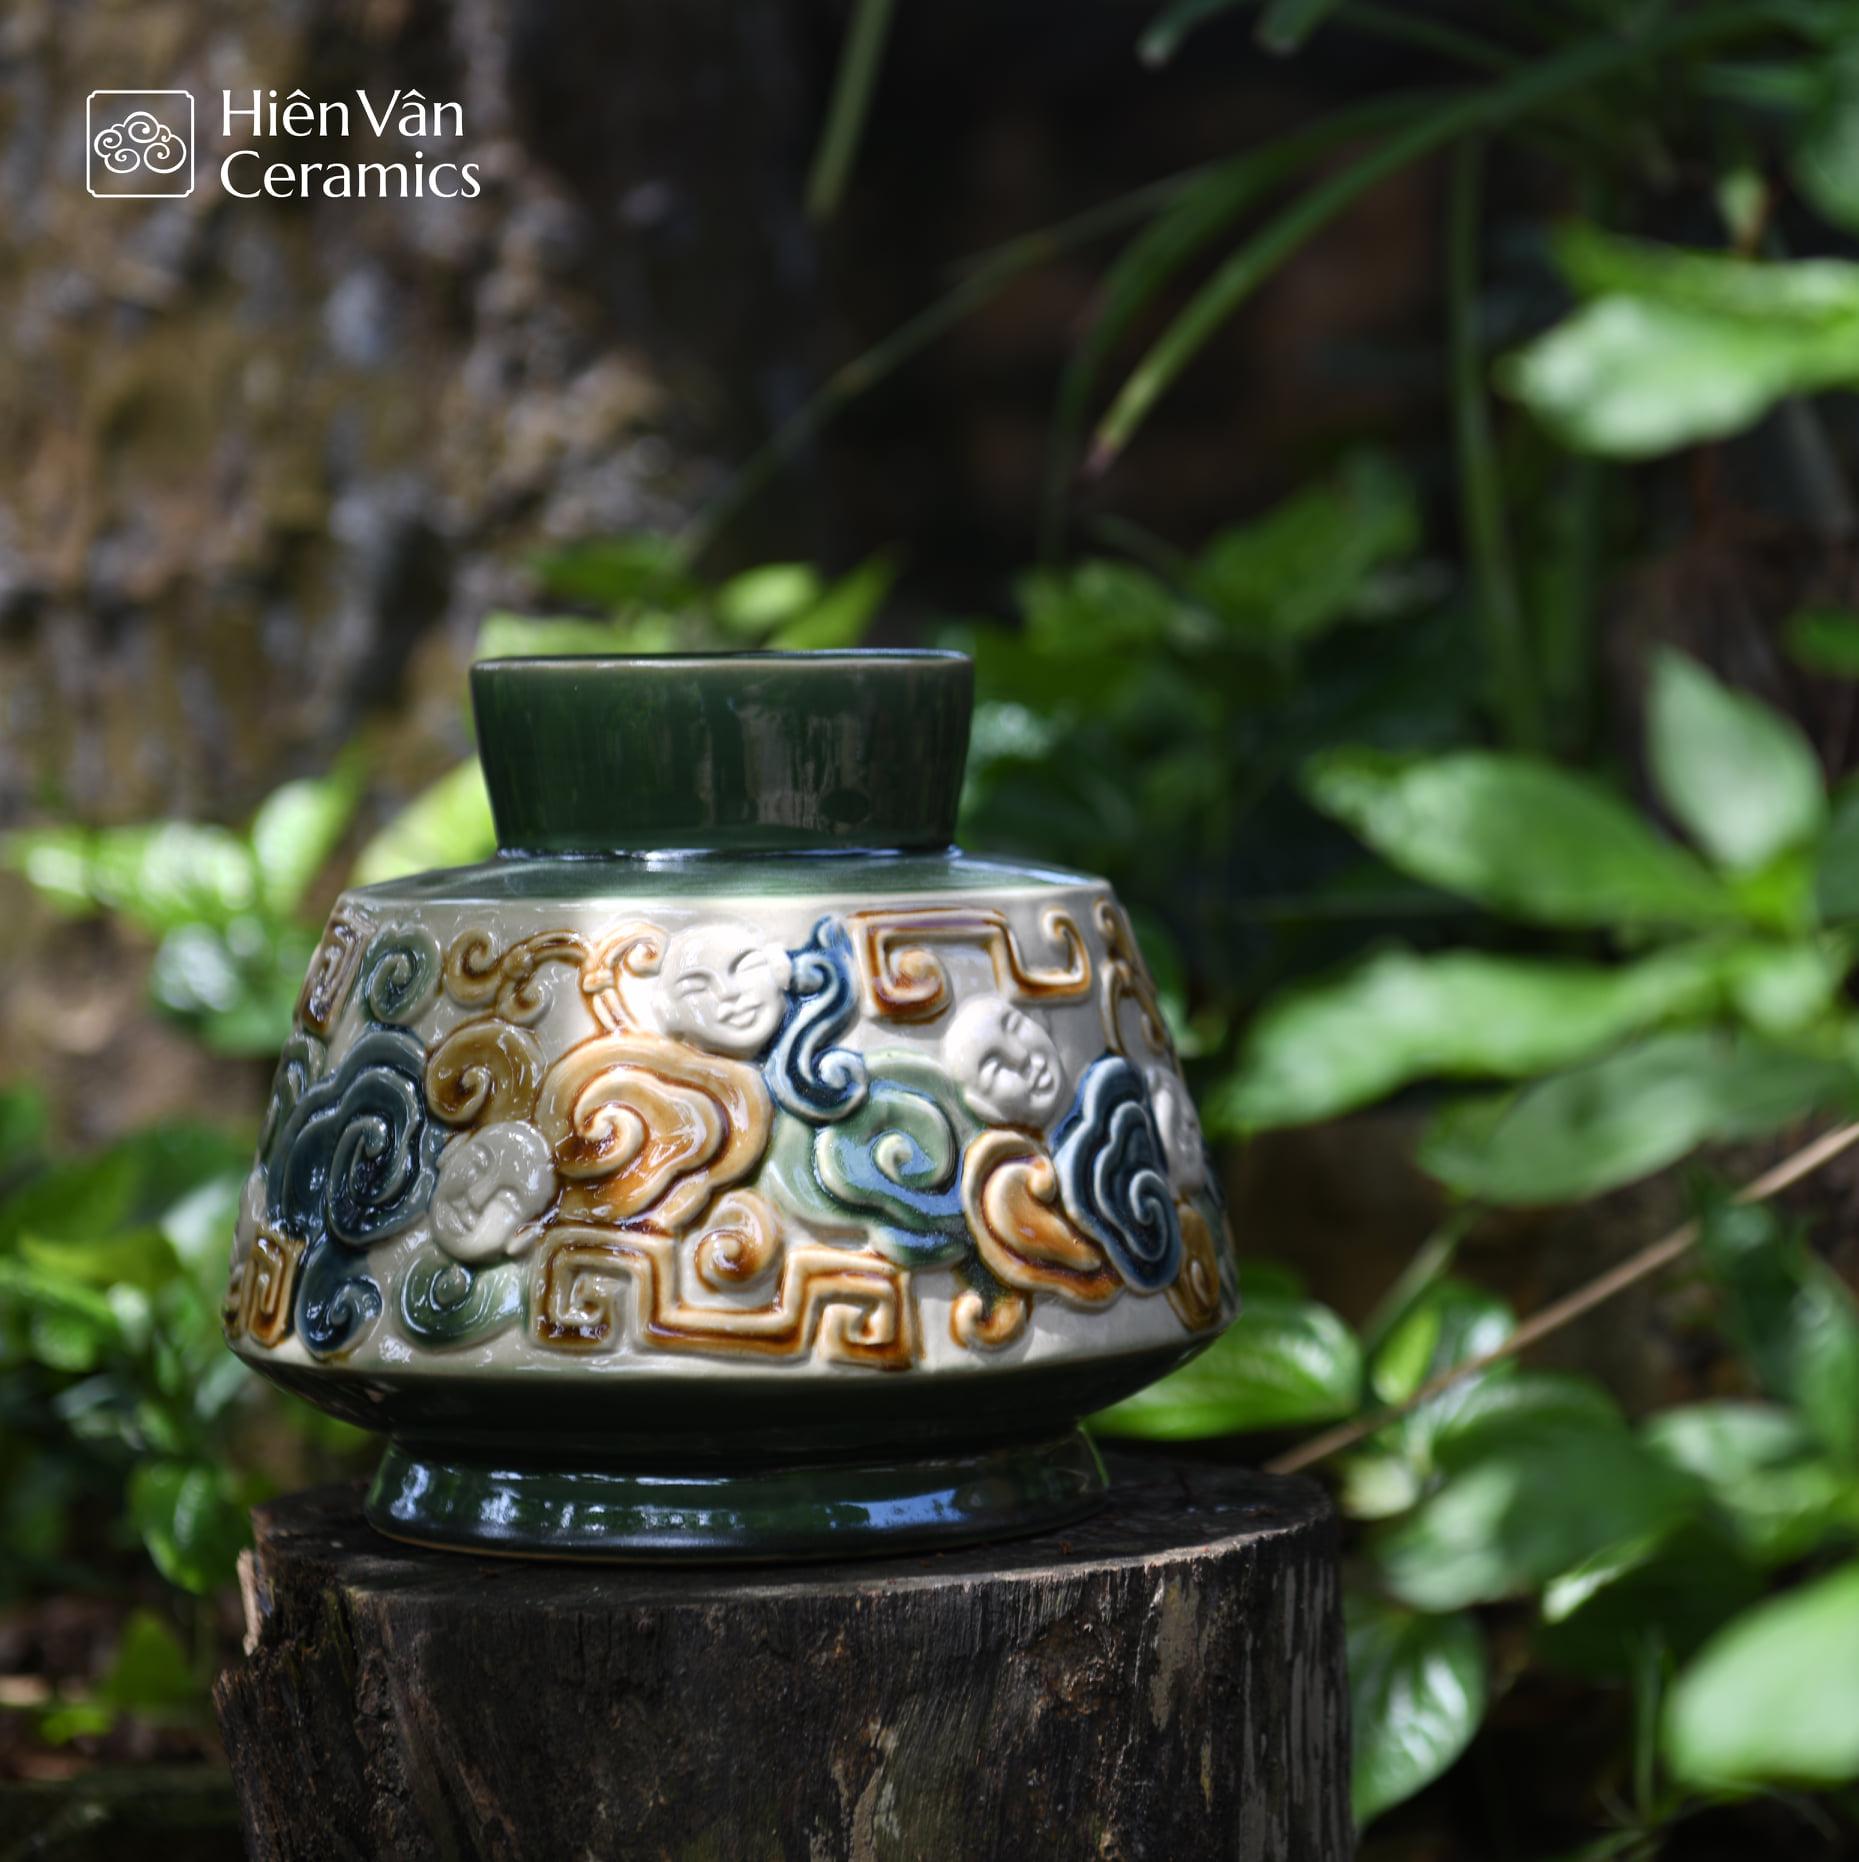 binh-gom-nguoi-may-hien-van-ceramics-sap-chang-sen